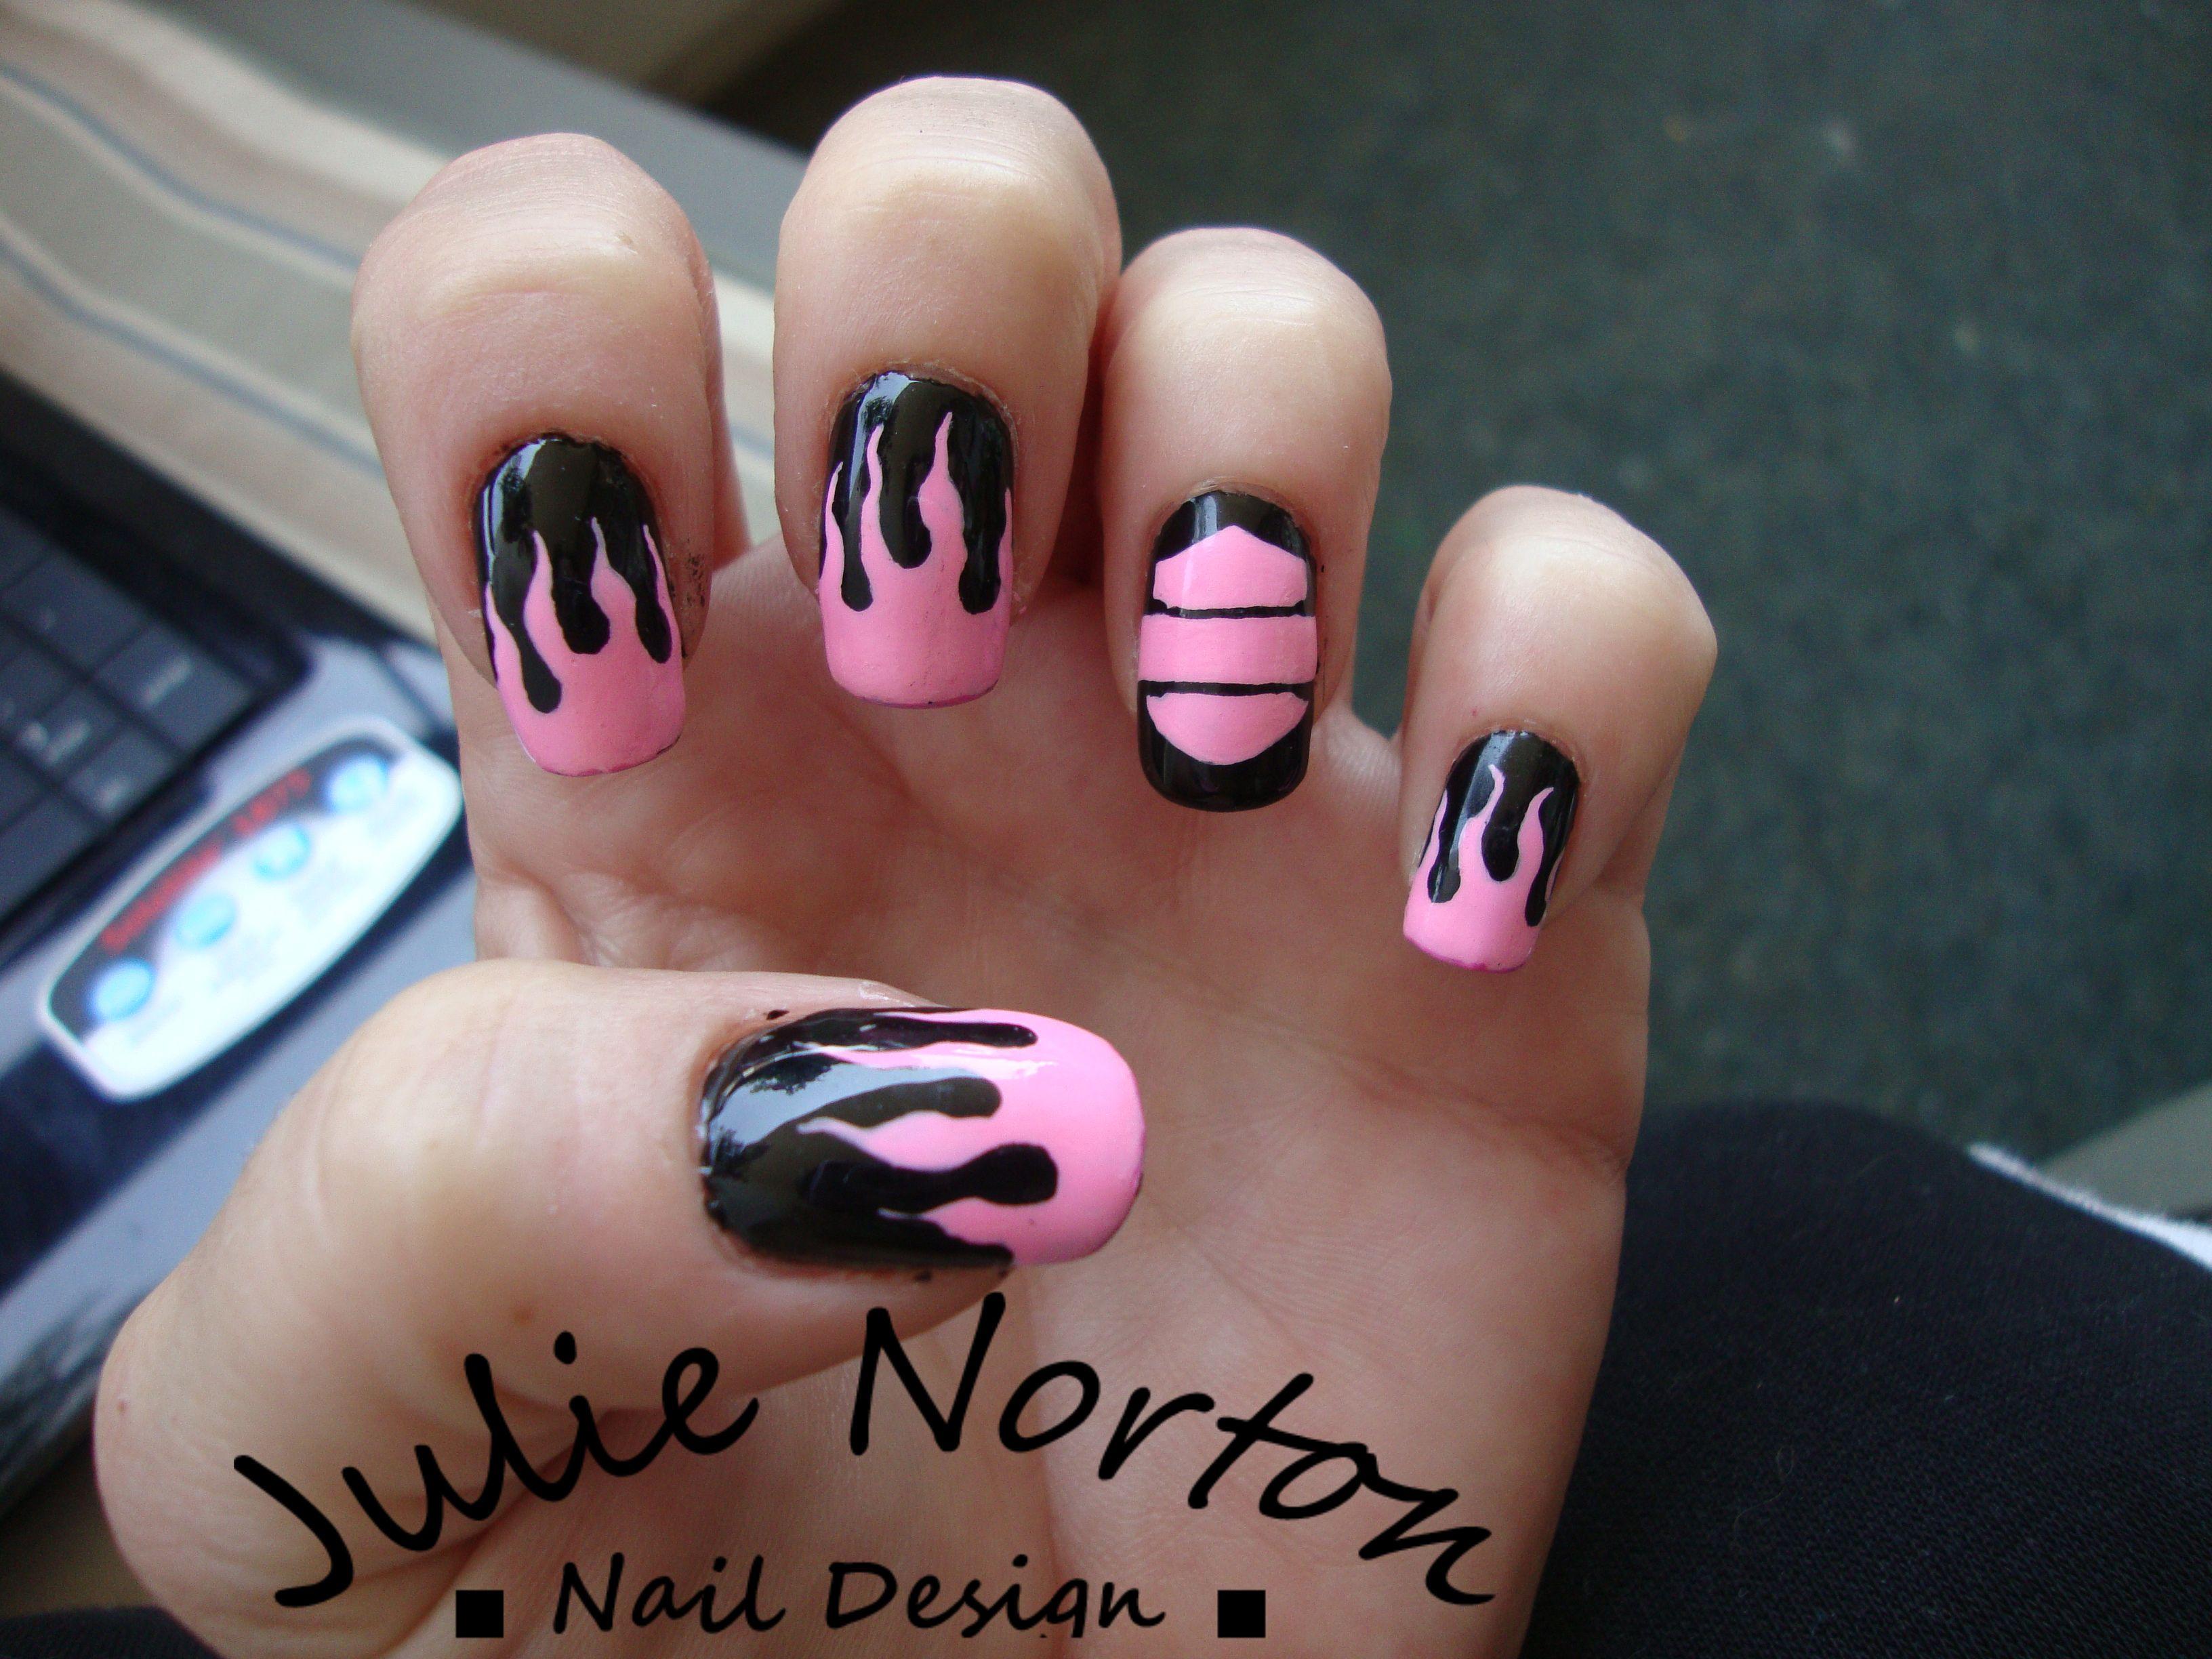 Harley Davidson Nails | Some of my Nail Art | Pinterest